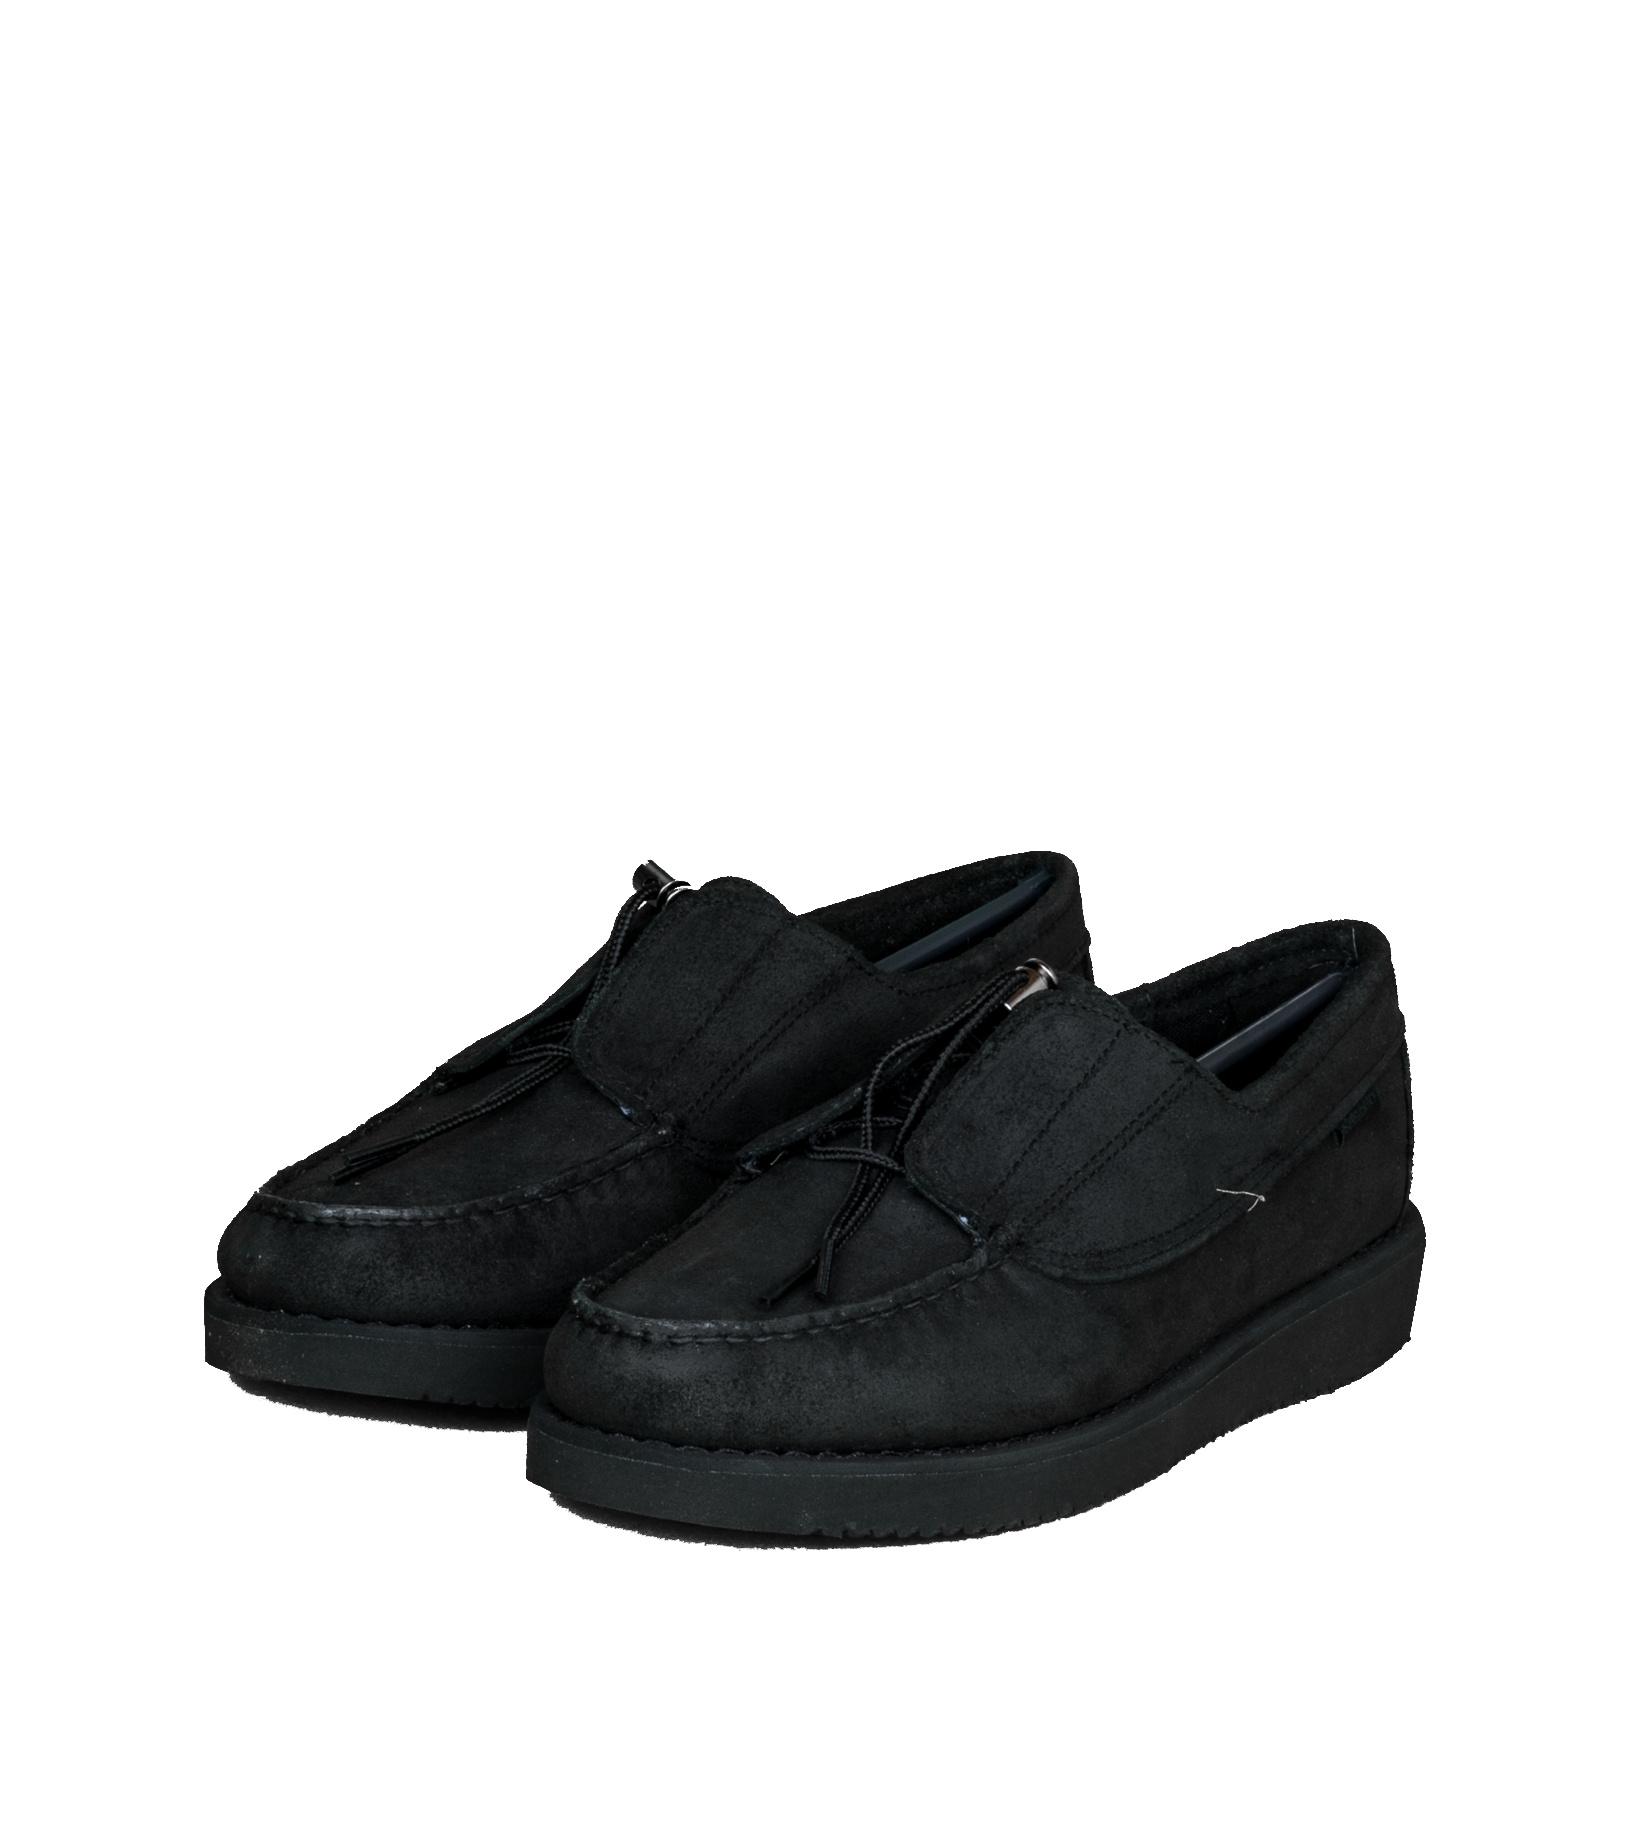 "Coverdeck x Engineered Garments ""Black ""-1"